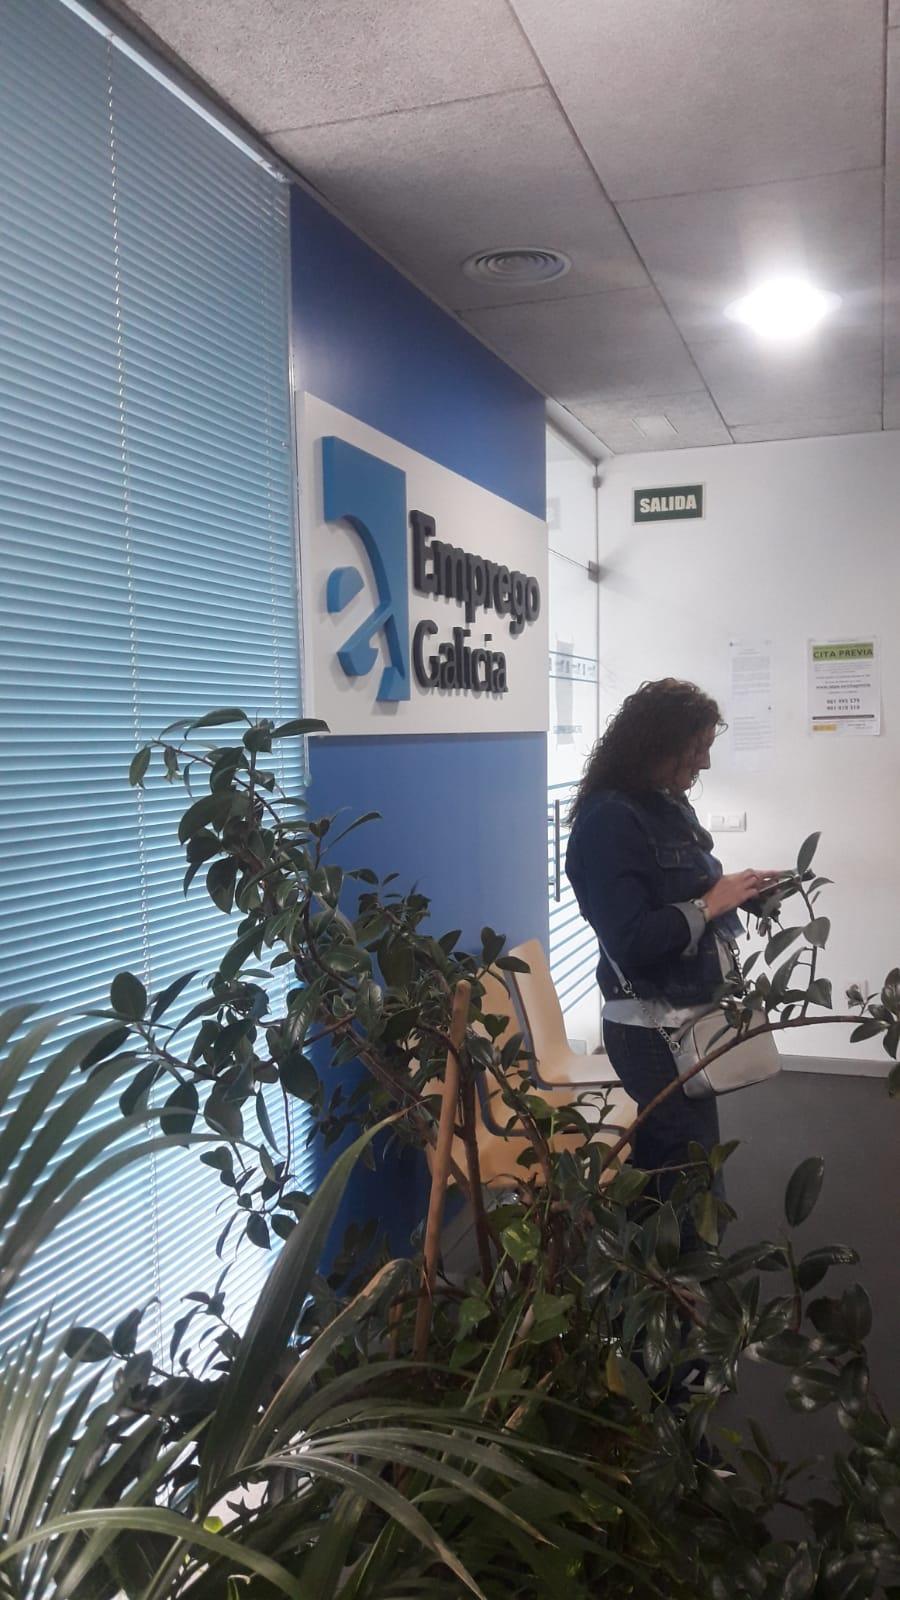 http://luzcoruna.es/wp-content/uploads/2020/03/Emprego-Galicia_Boiro-2.jpg